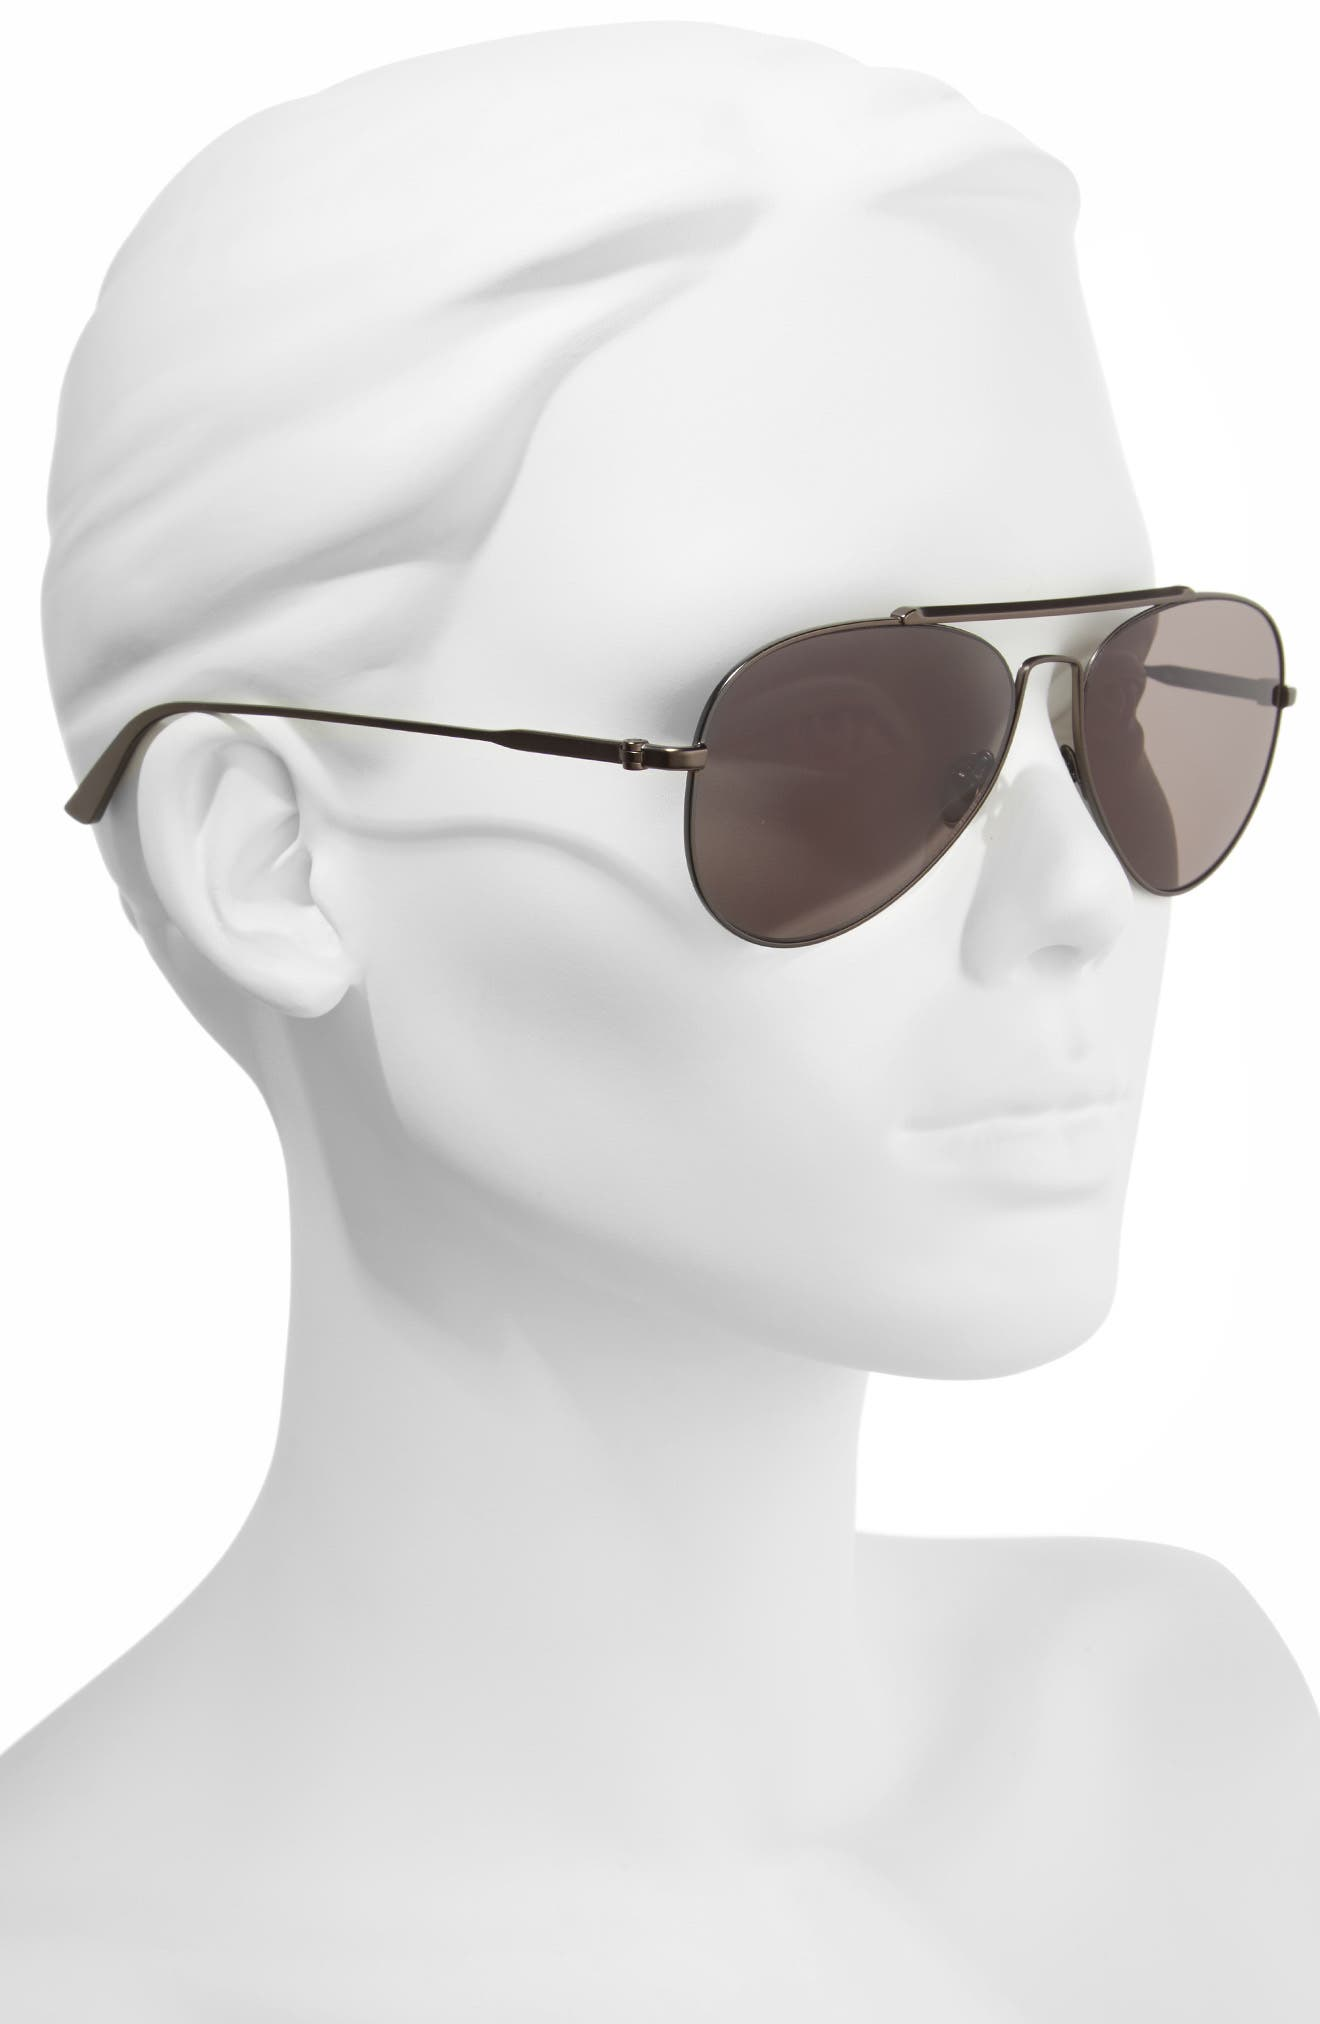 58mm Aviator Sunglasses,                             Alternate thumbnail 2, color,                             Satin Titanium